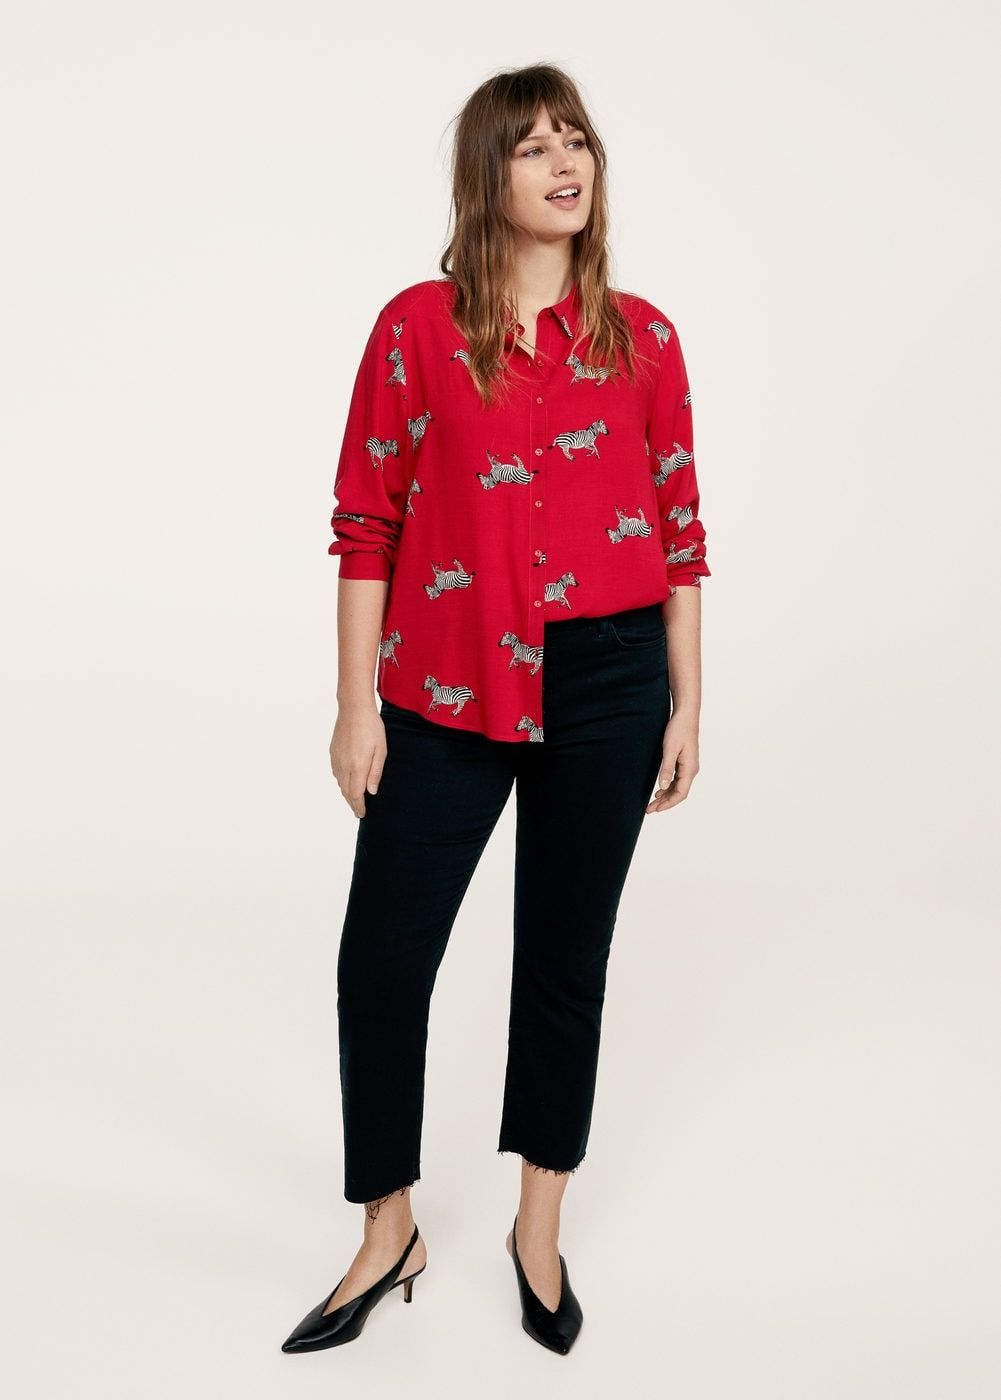 780dfbde2ff880 Animal print shirt - Plus sizes | Shopping List | Pinterest | Animal ...